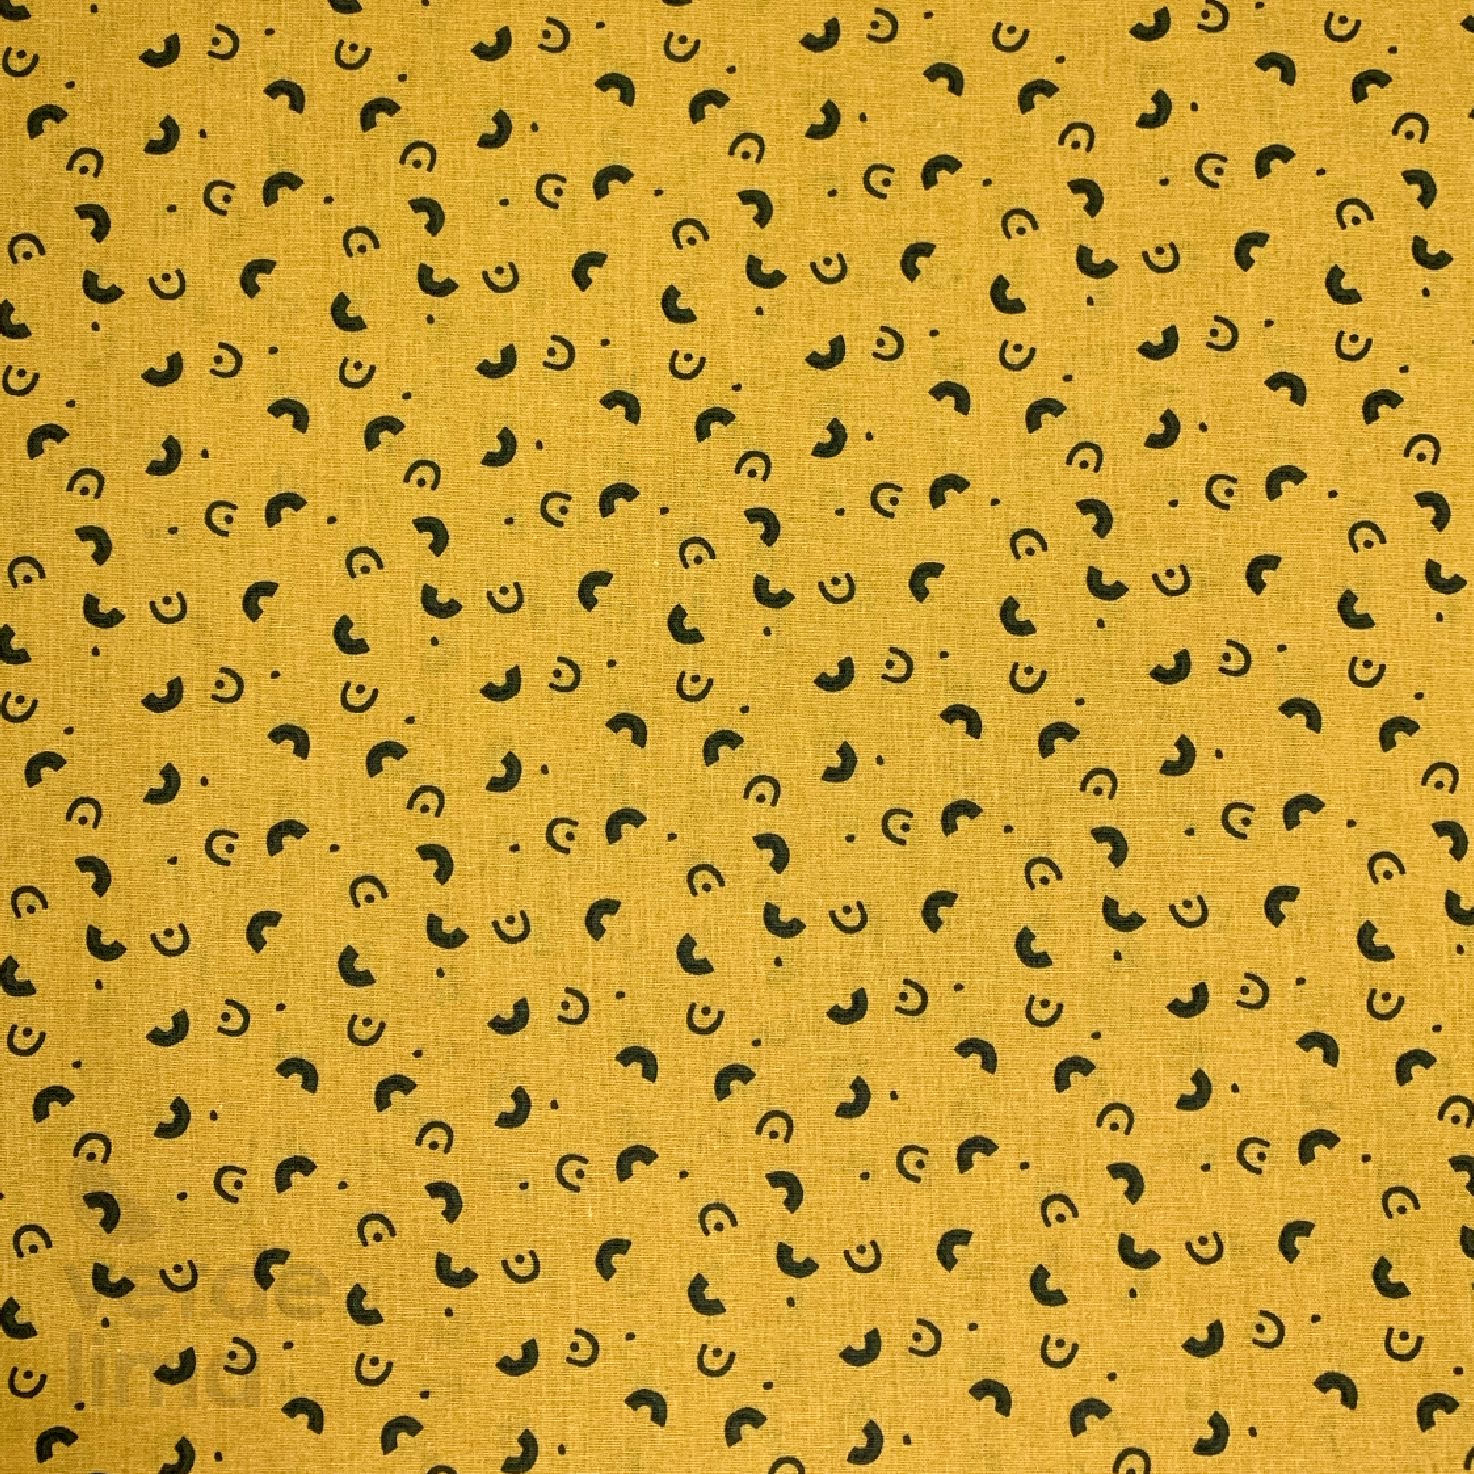 Astro kitty and friends - arcos fundo amarelo